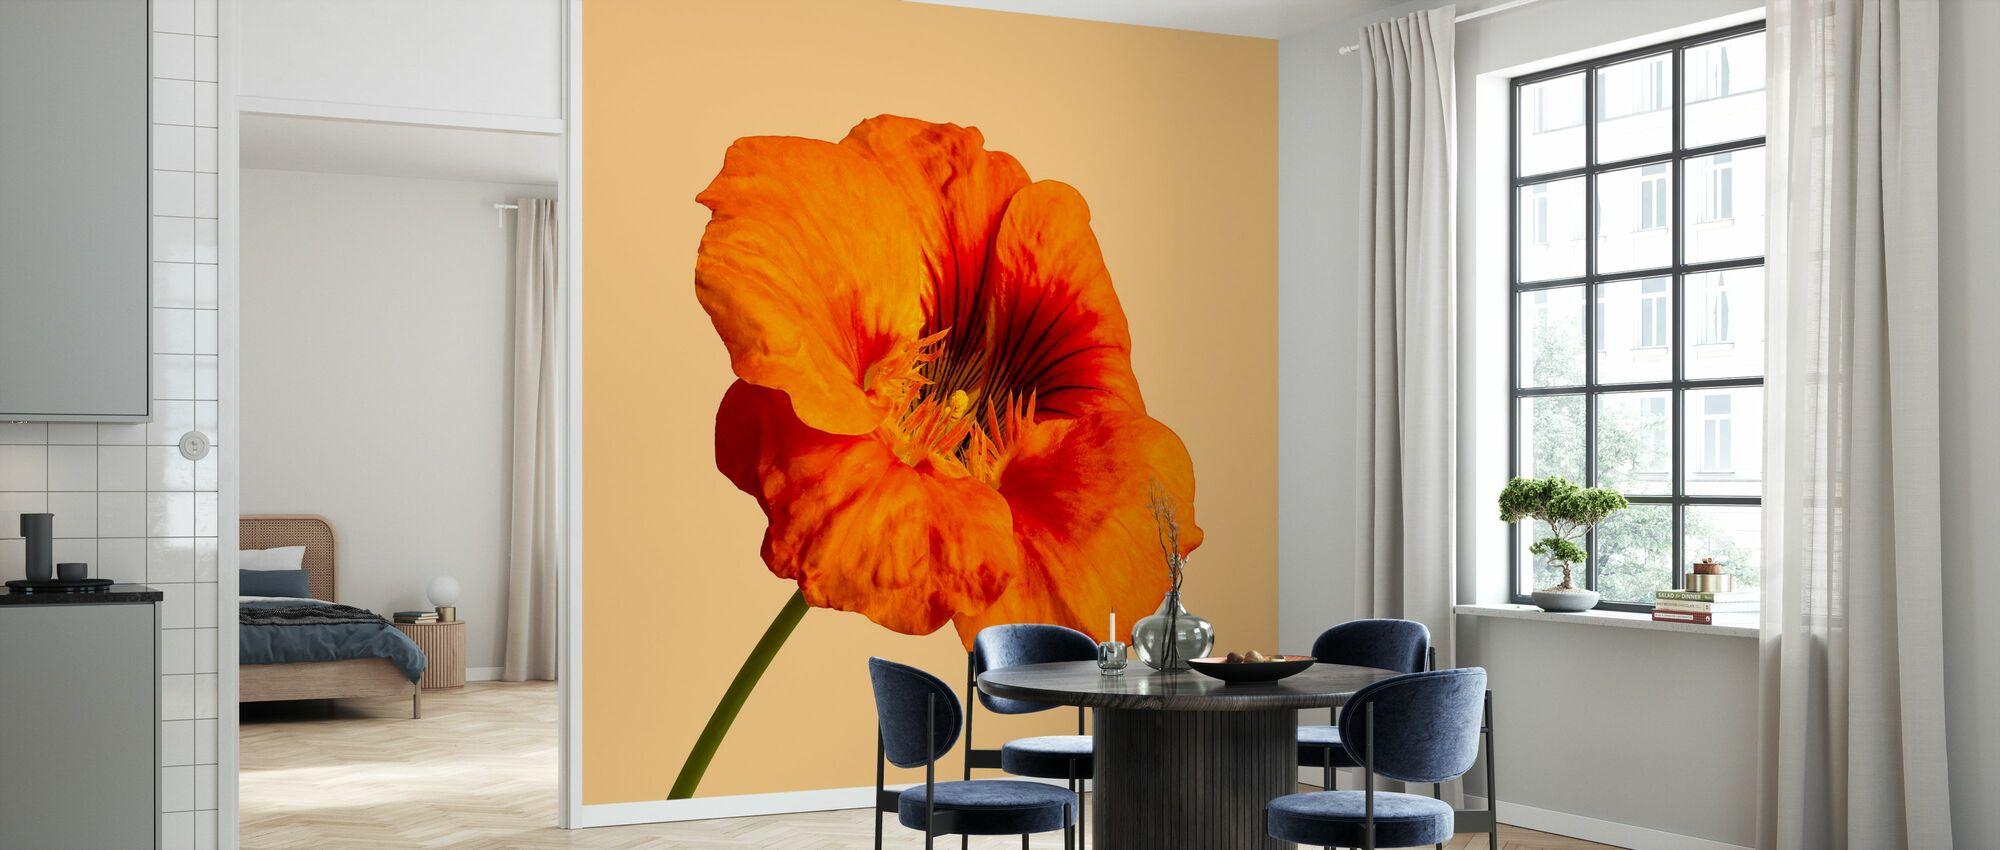 Blomstrende Hibiscus - Tapet - Køkken